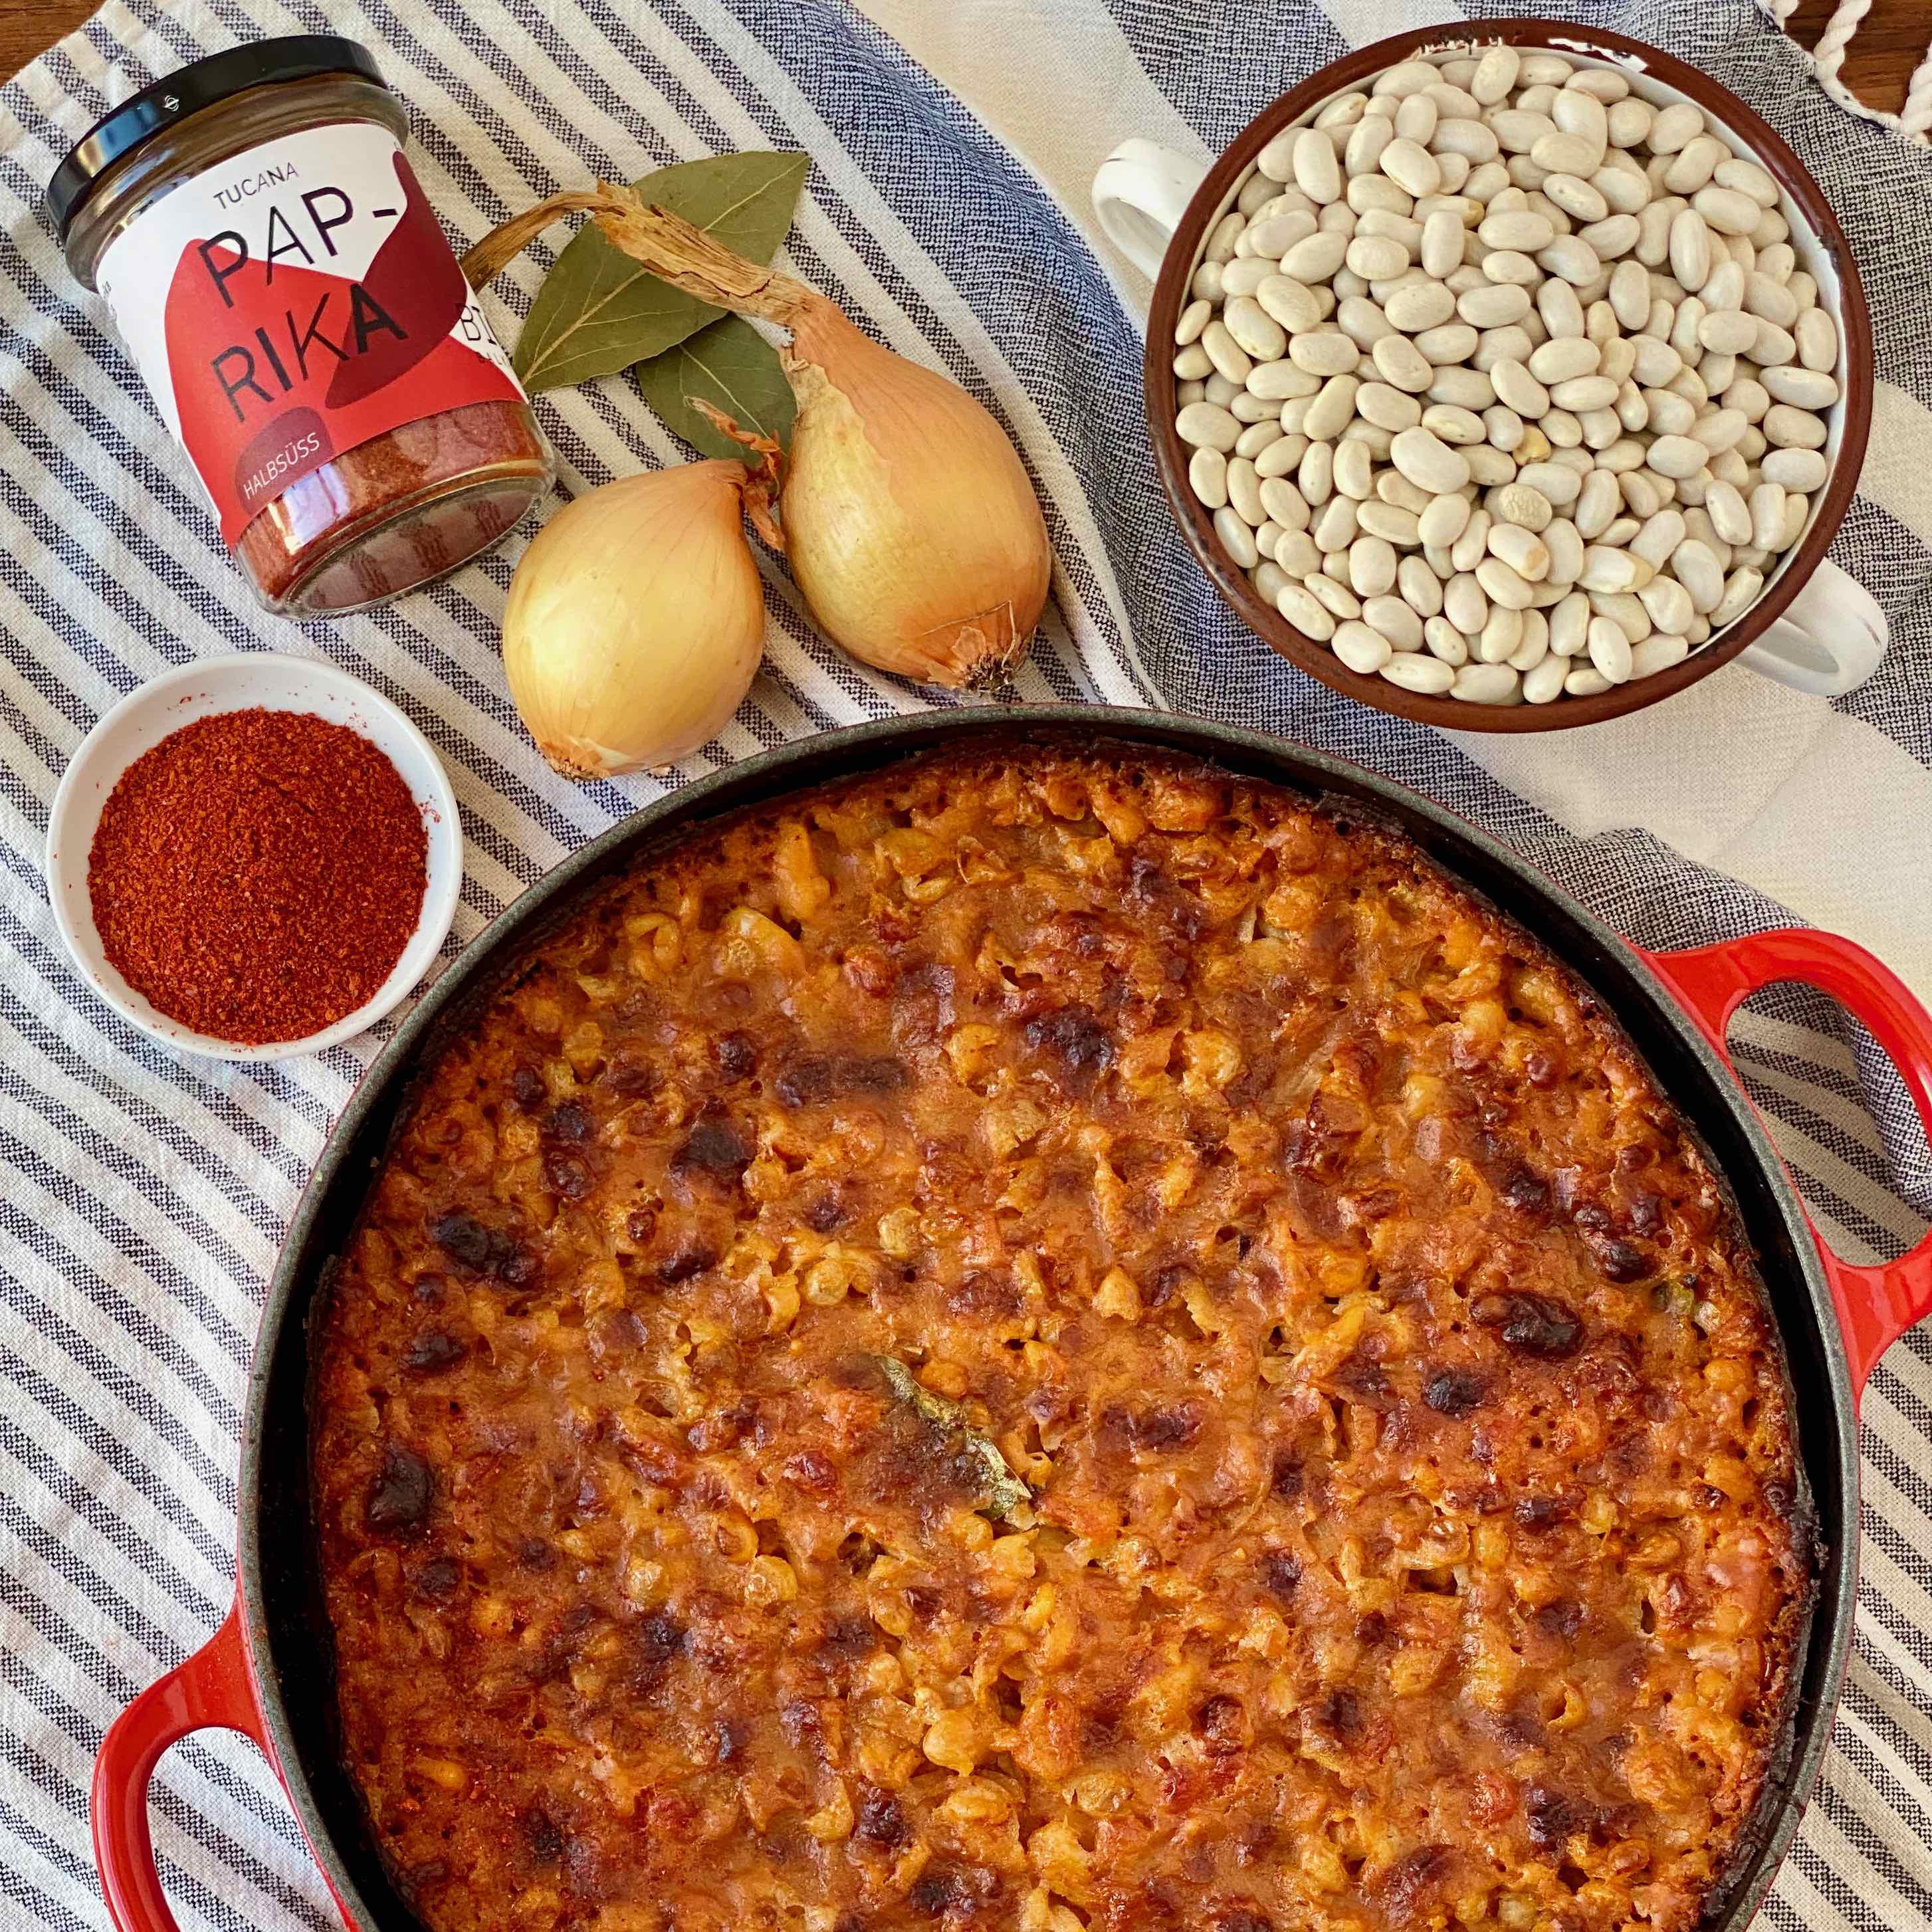 Klassiker der Balkan Küche Prebranac oder Gravce na Tavce sind Baked Beans – gebackene Bohnen – auf Balkan-Art